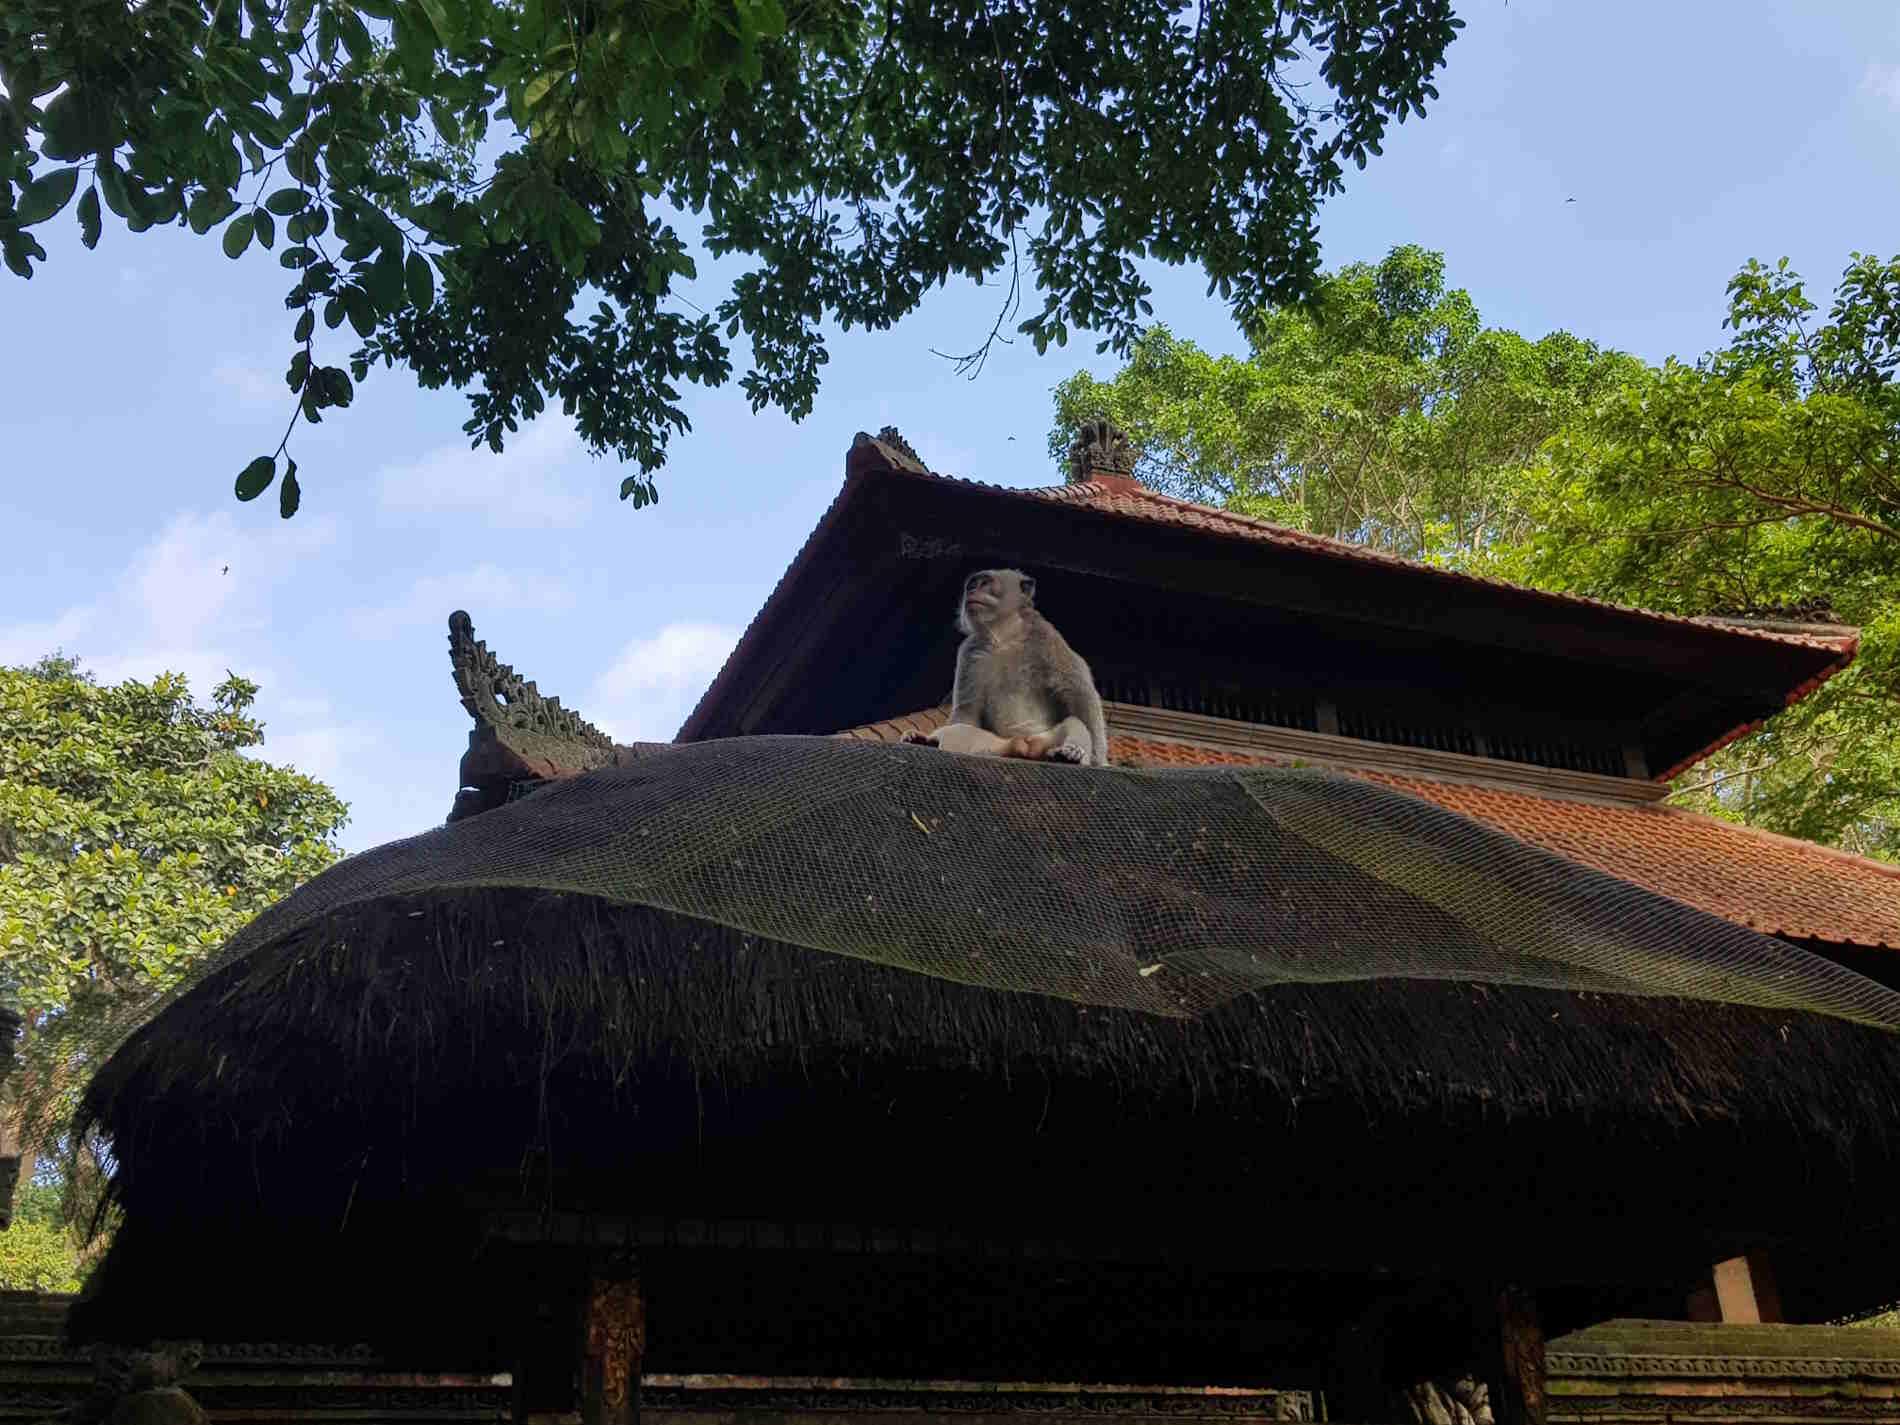 Viaggio a bali - Sacred Monkey Forest a Ubud: La Sacra Foresta delle scimme a Ubud